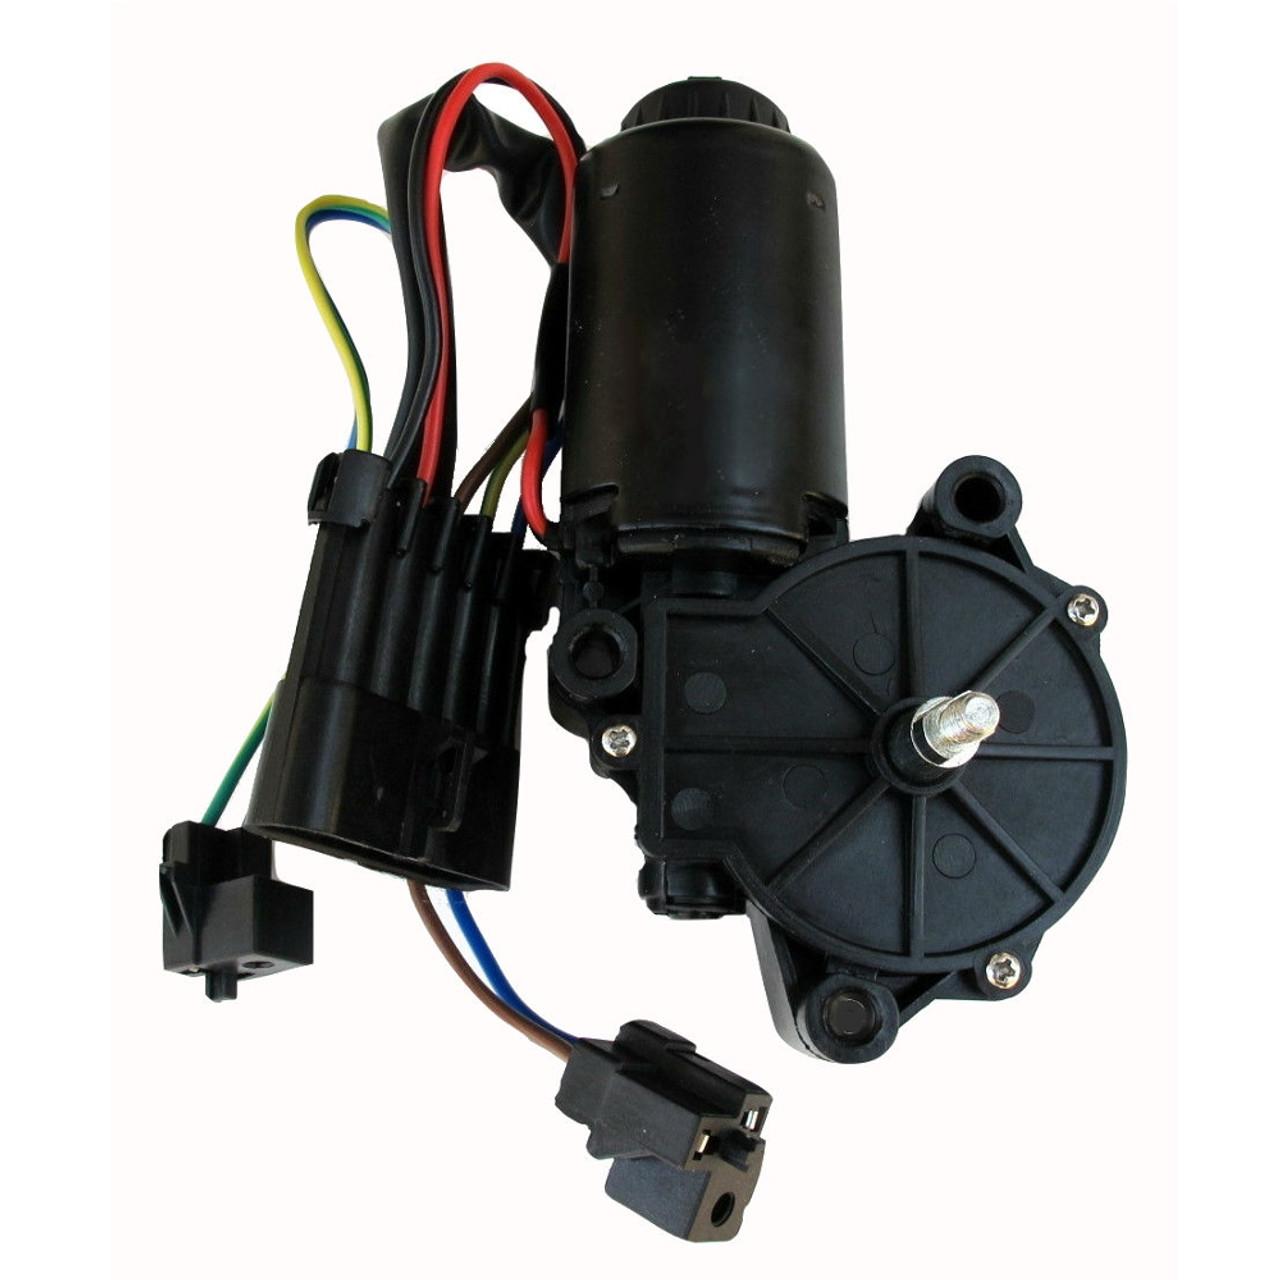 hight resolution of new 1998 2002 firebird headlight actuator motor wire harness lh westcoast autoparts com